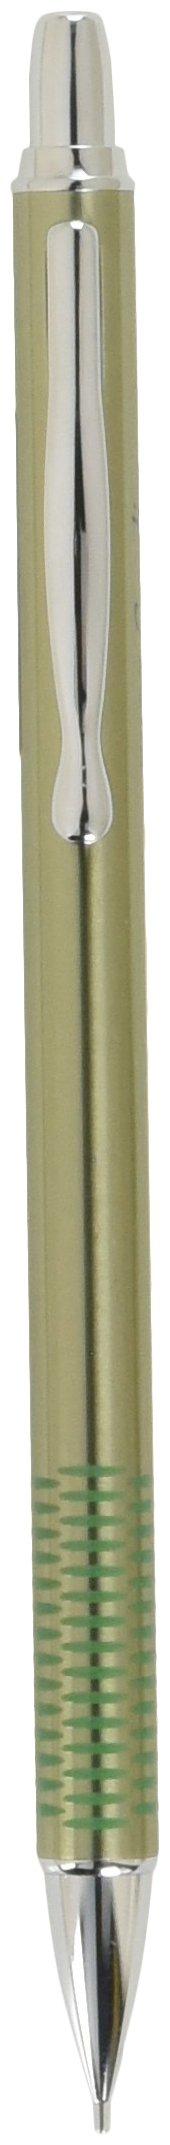 Pilot Cavalier 1SR - Portaminas (0,5 mm), color verde